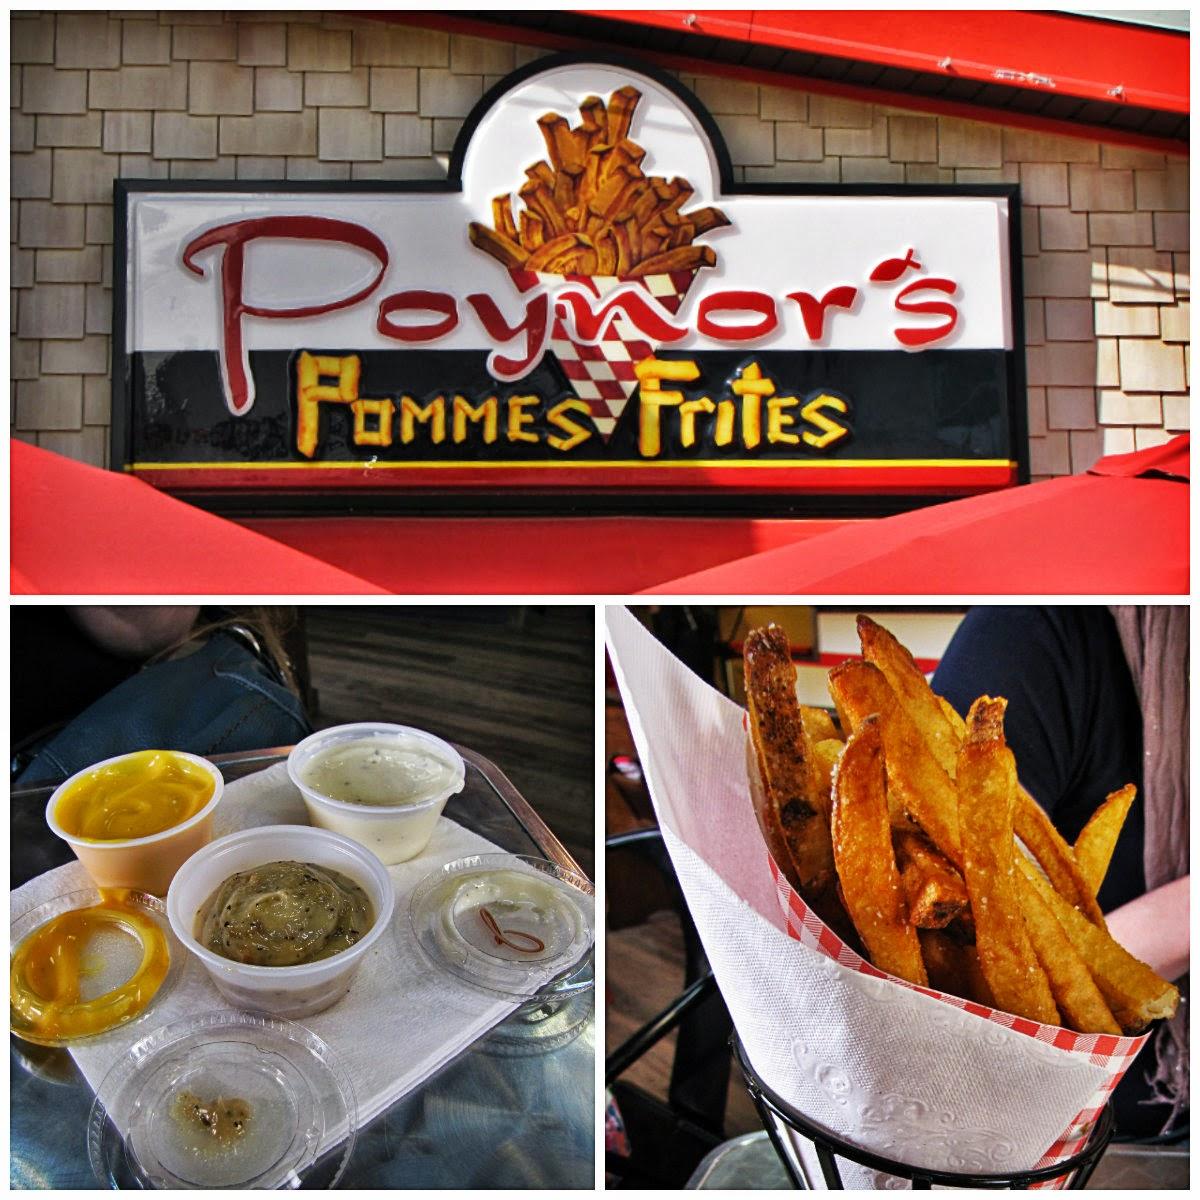 Poynor's Pommes Frites